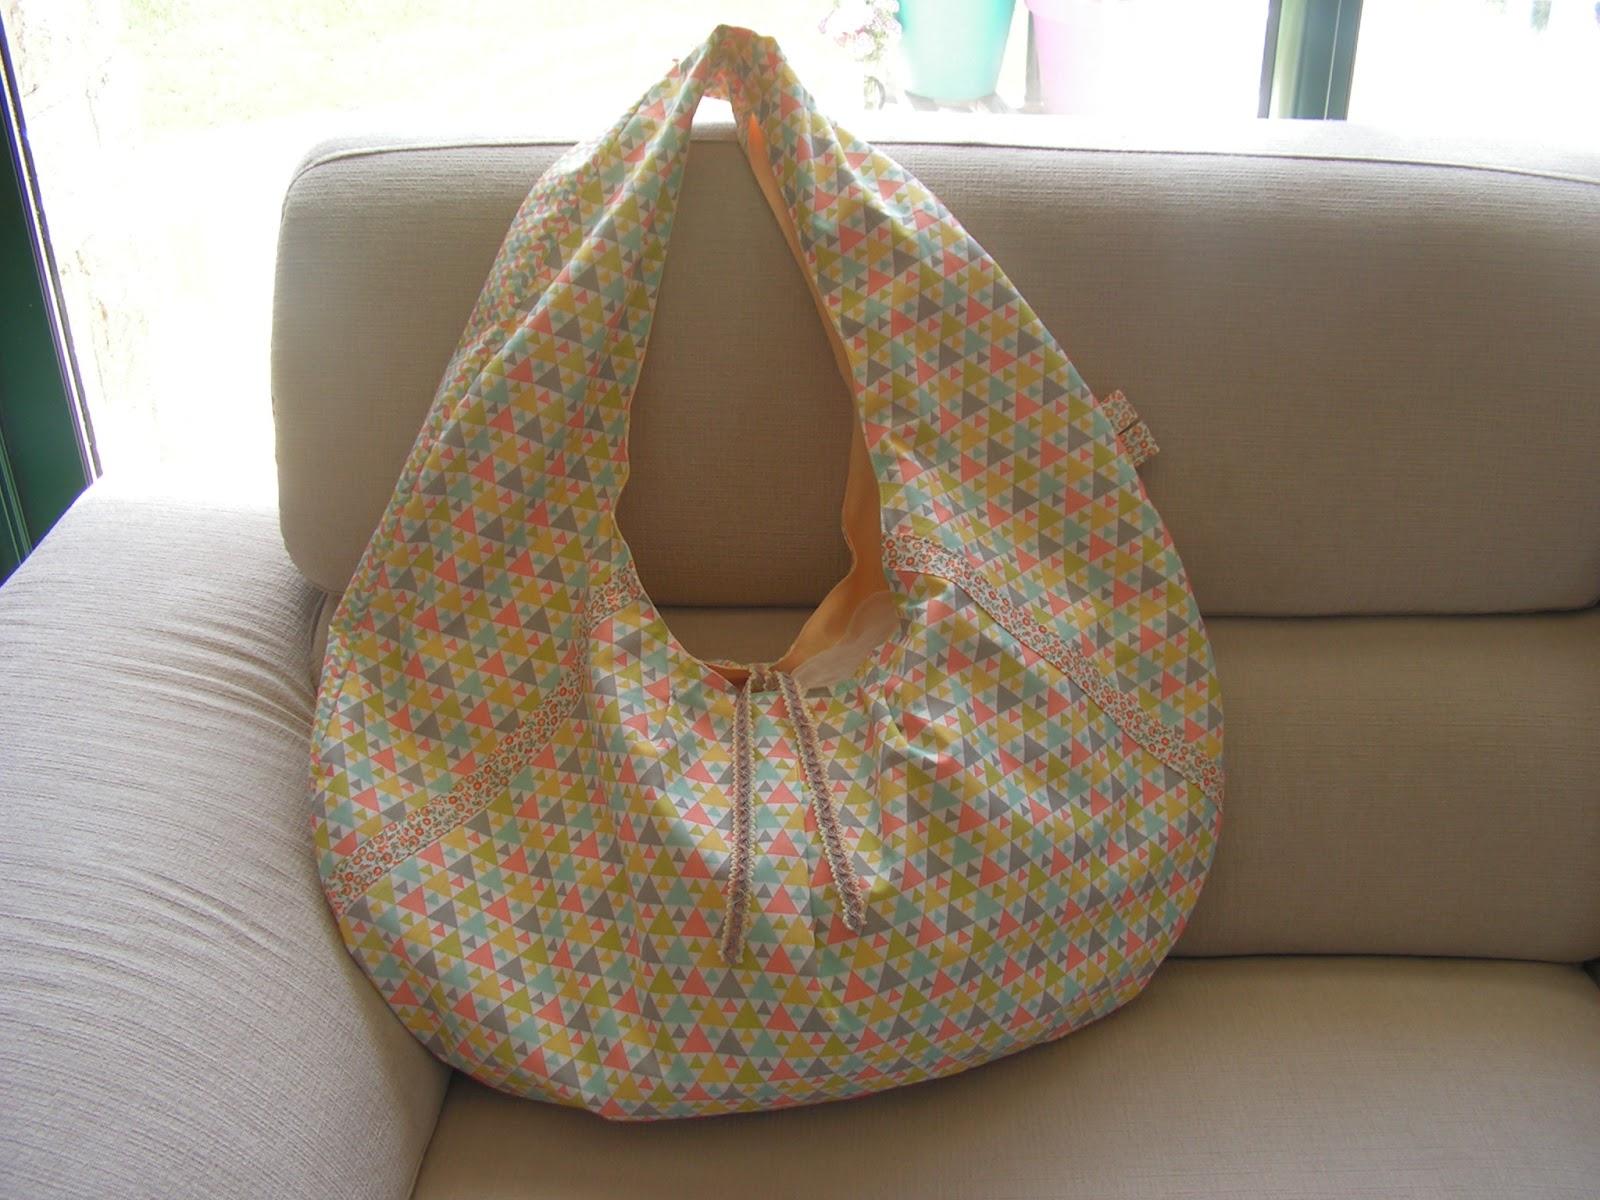 couture loisir sac de plage femme. Black Bedroom Furniture Sets. Home Design Ideas